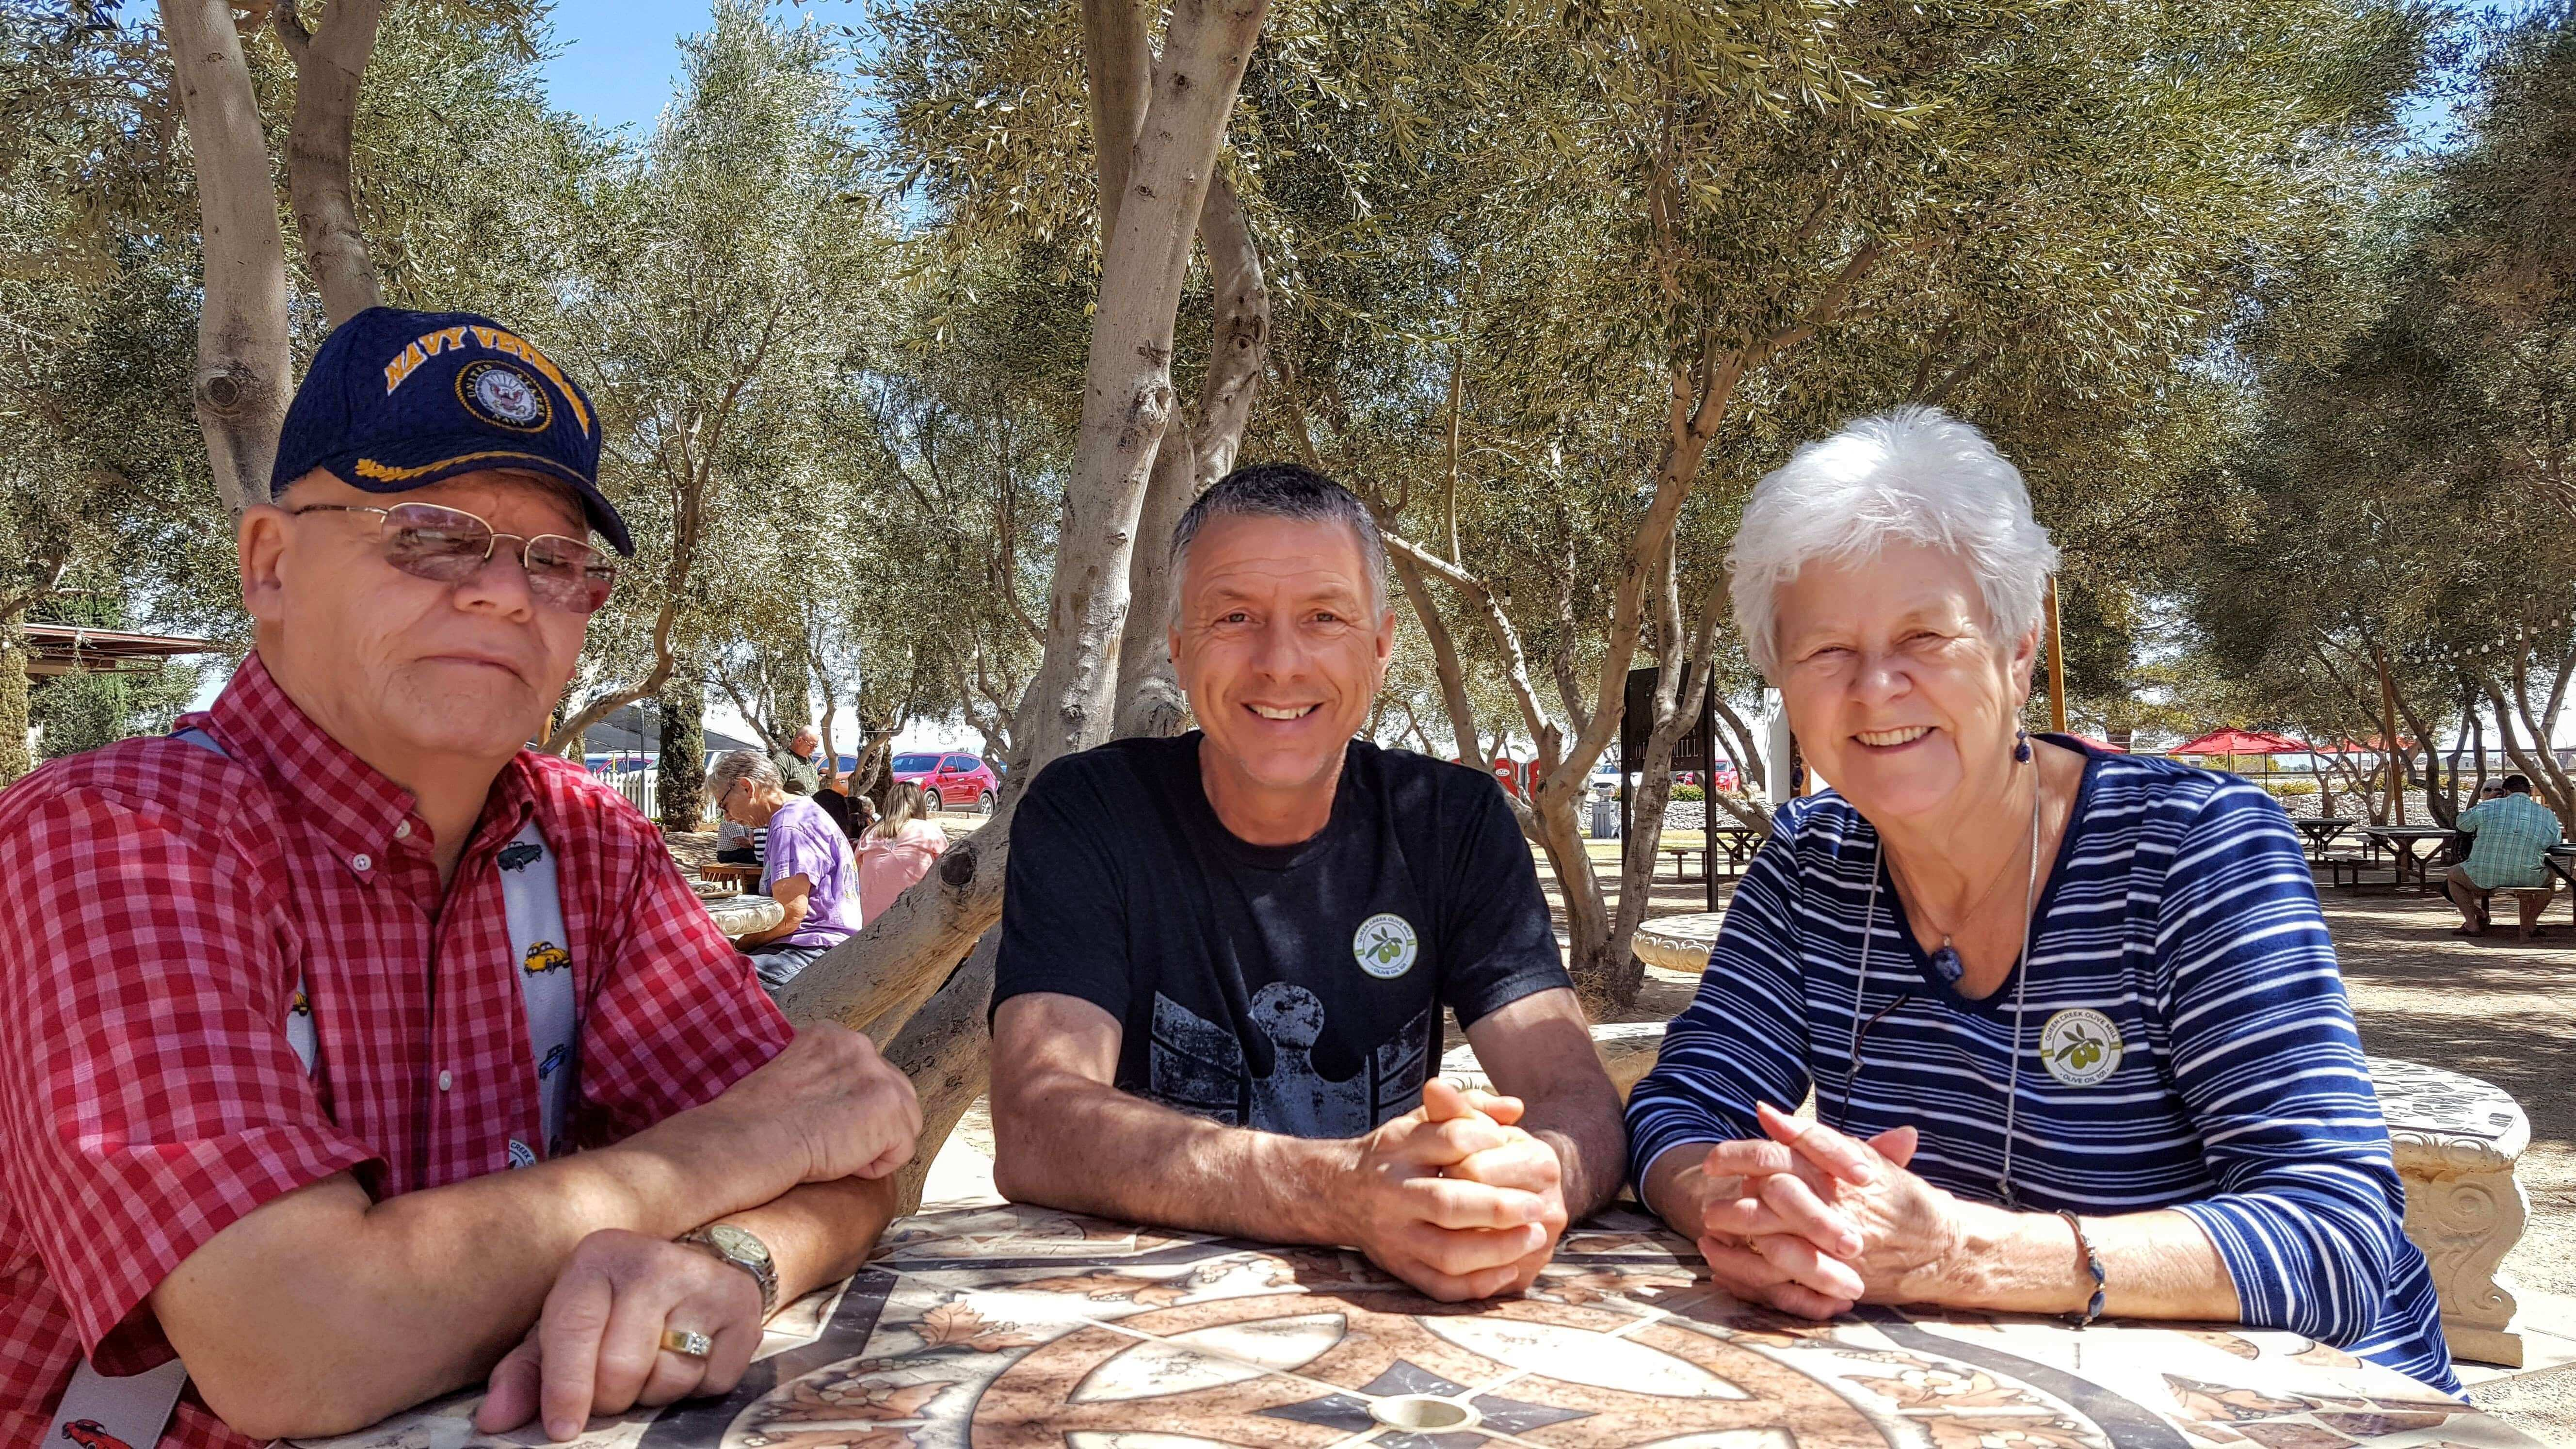 Fun at Queen Creek Olive Mill, Queen Creek, AZ